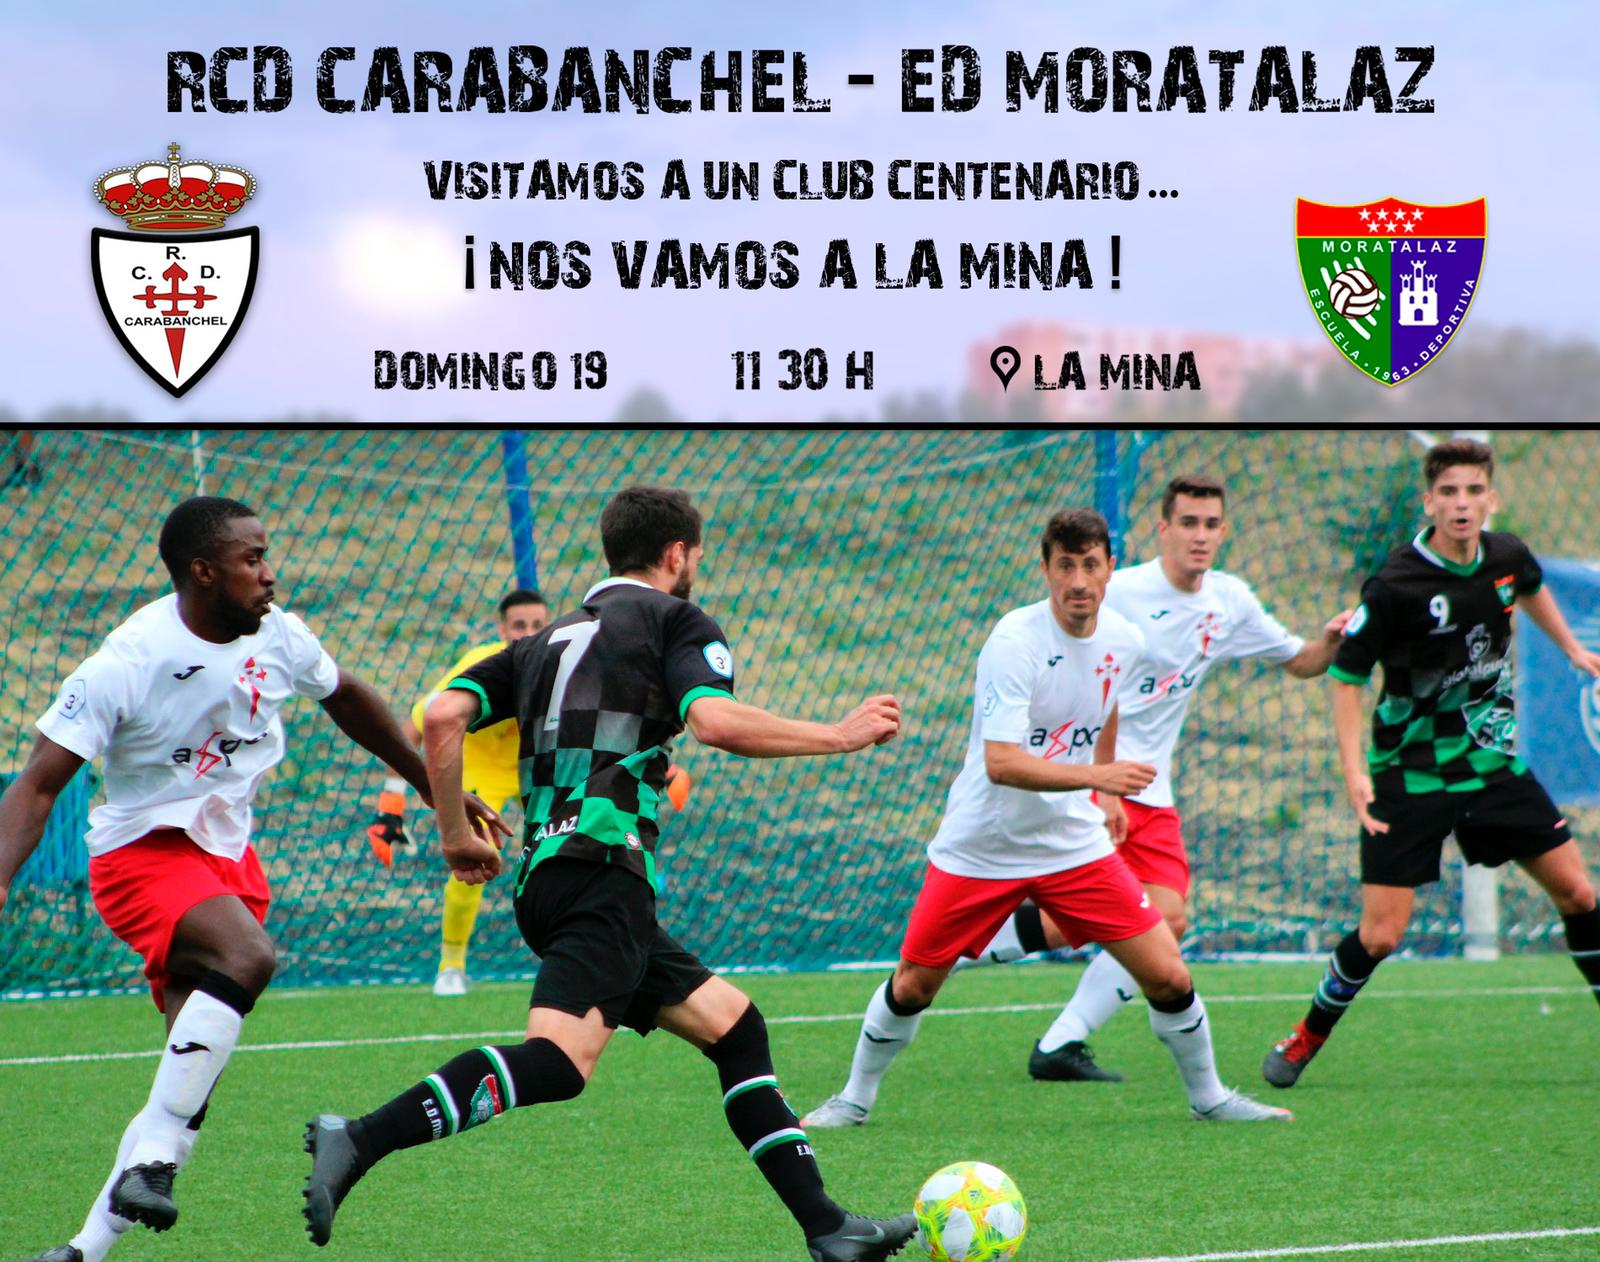 Previa | Real CD Carabanchel – Primer Equipo